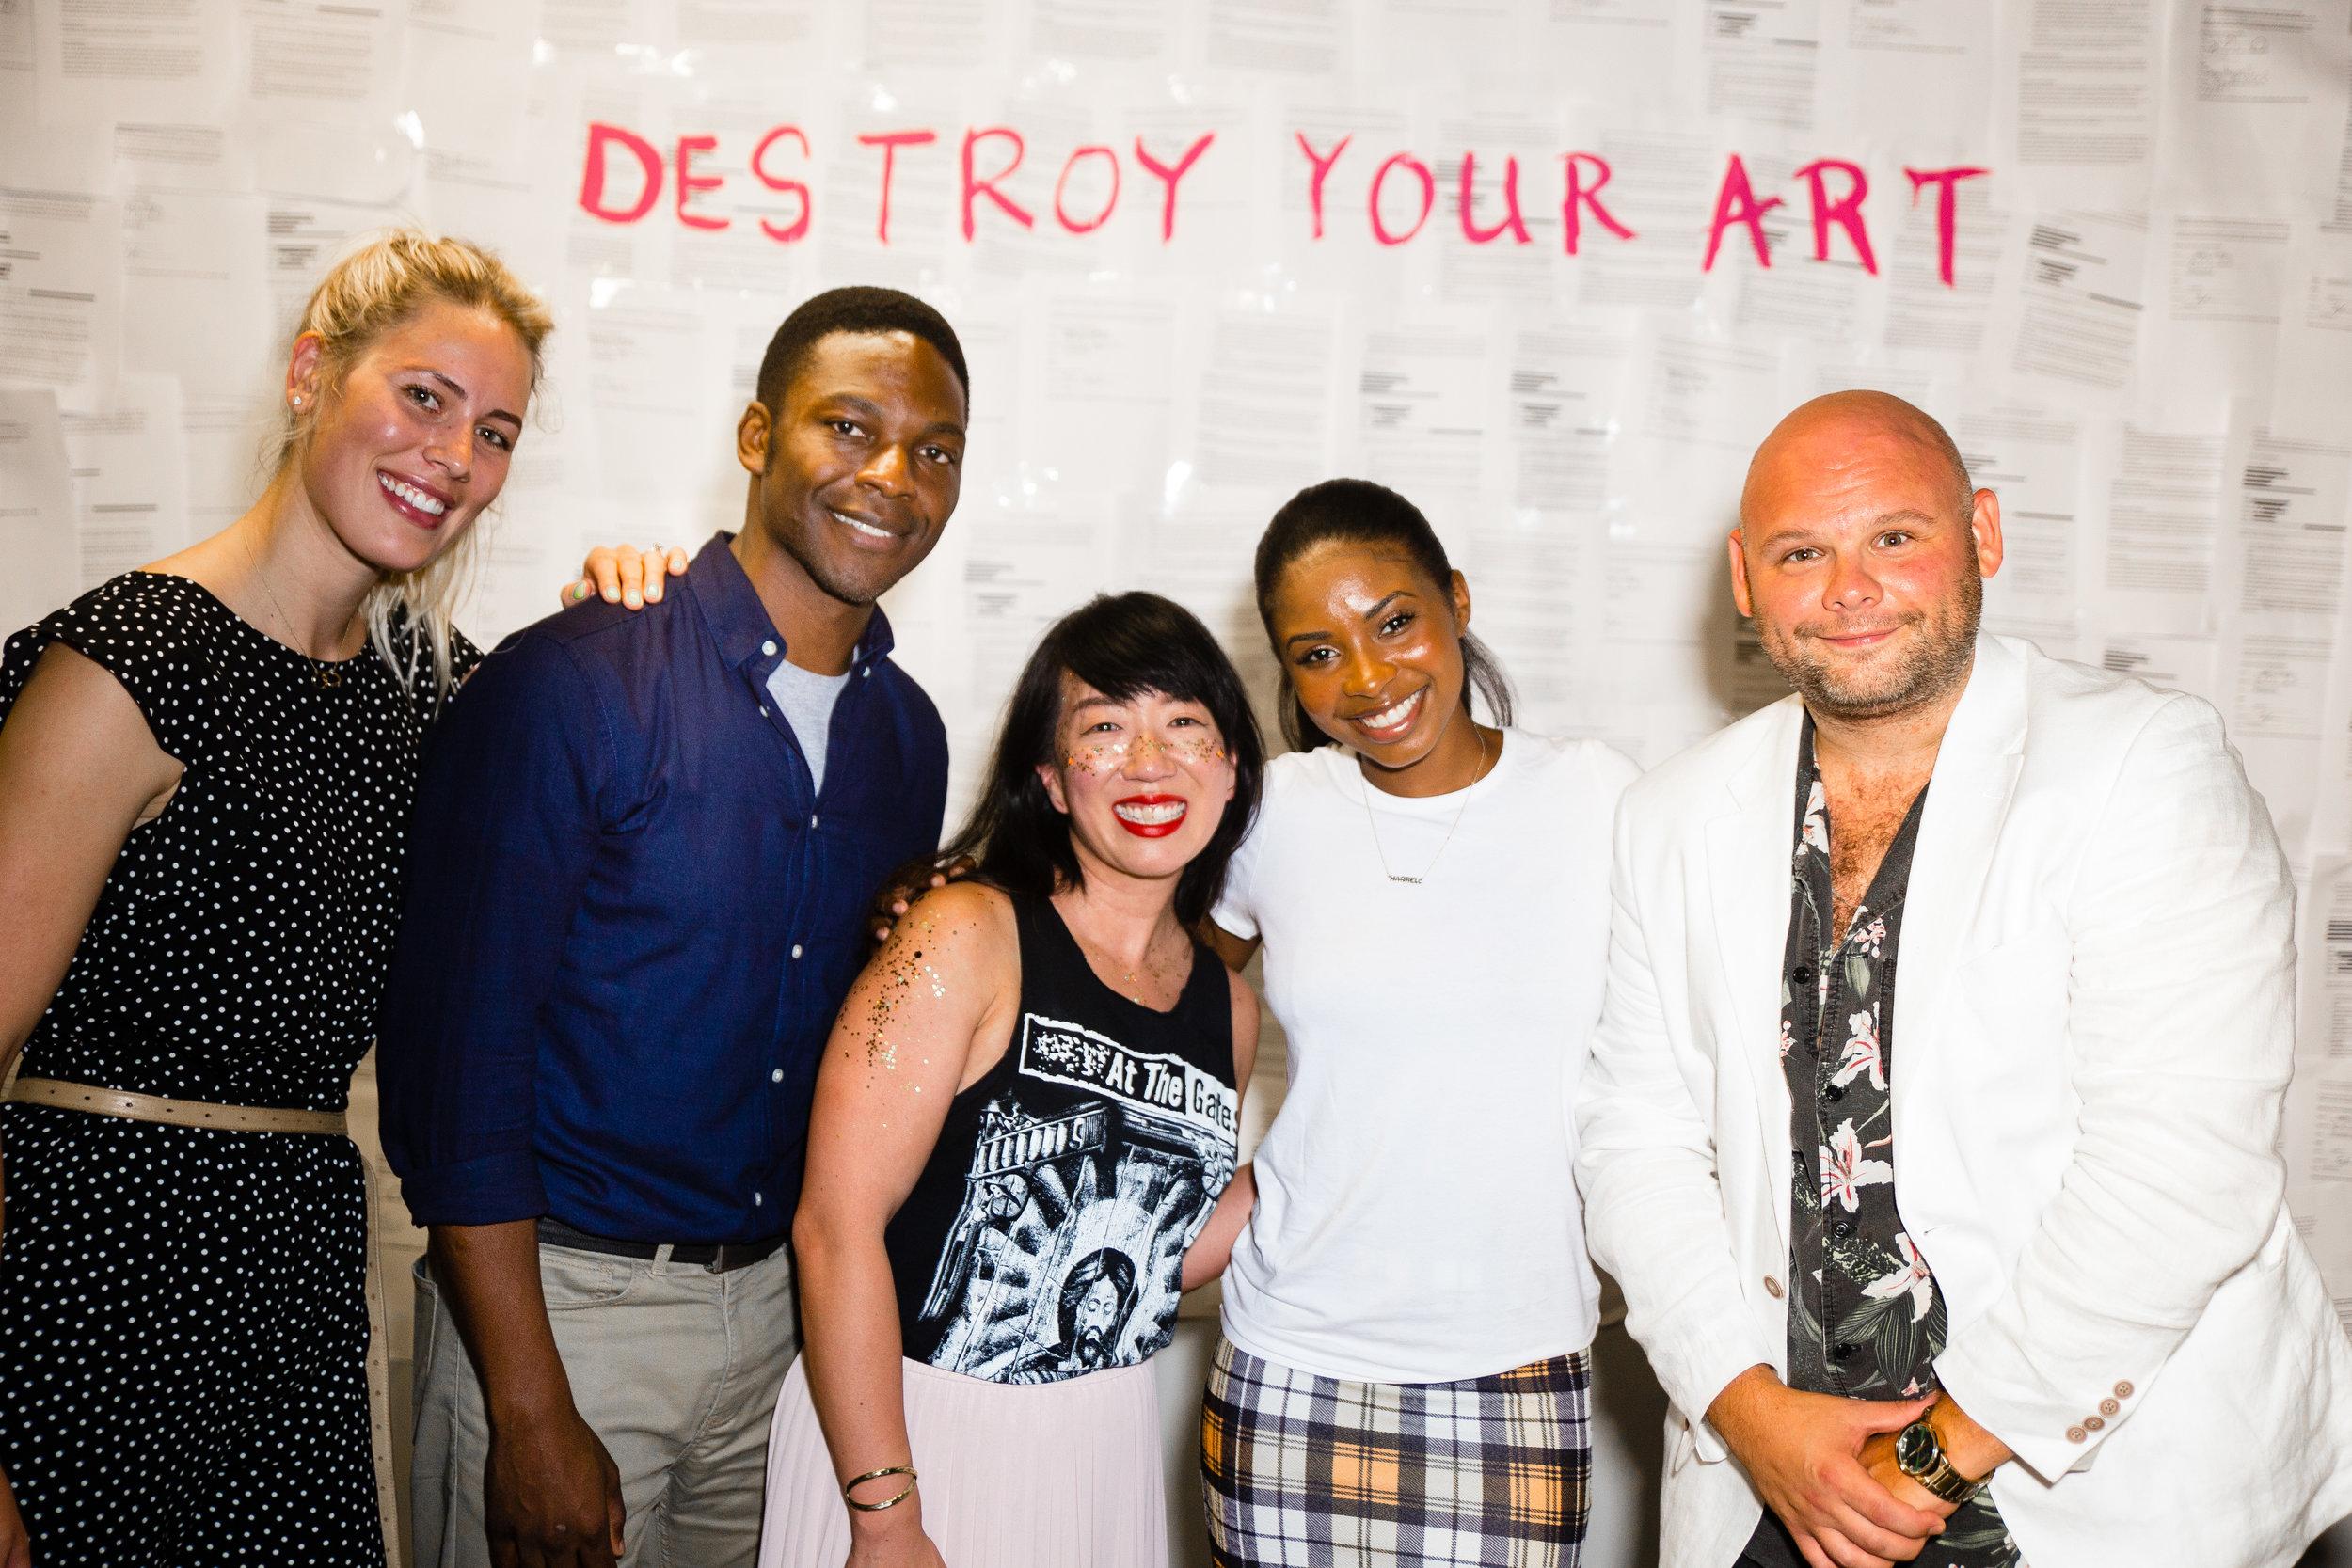 Destroy Your Art 08-10-18 timothymschmidt-1664.jpg